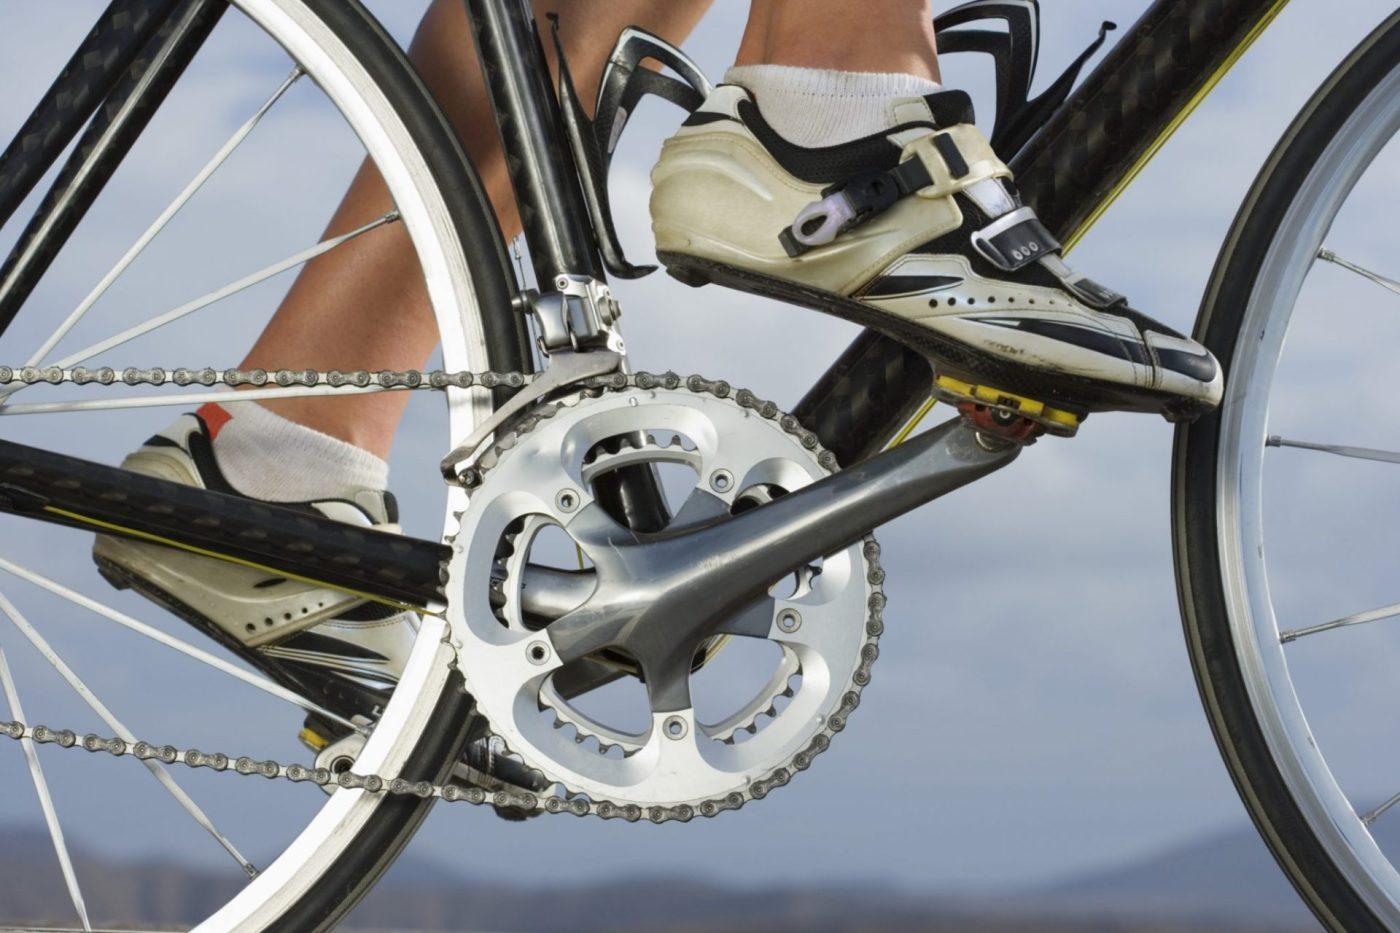 The Cycling Myth That Won't Die: Pedaling Circles 3